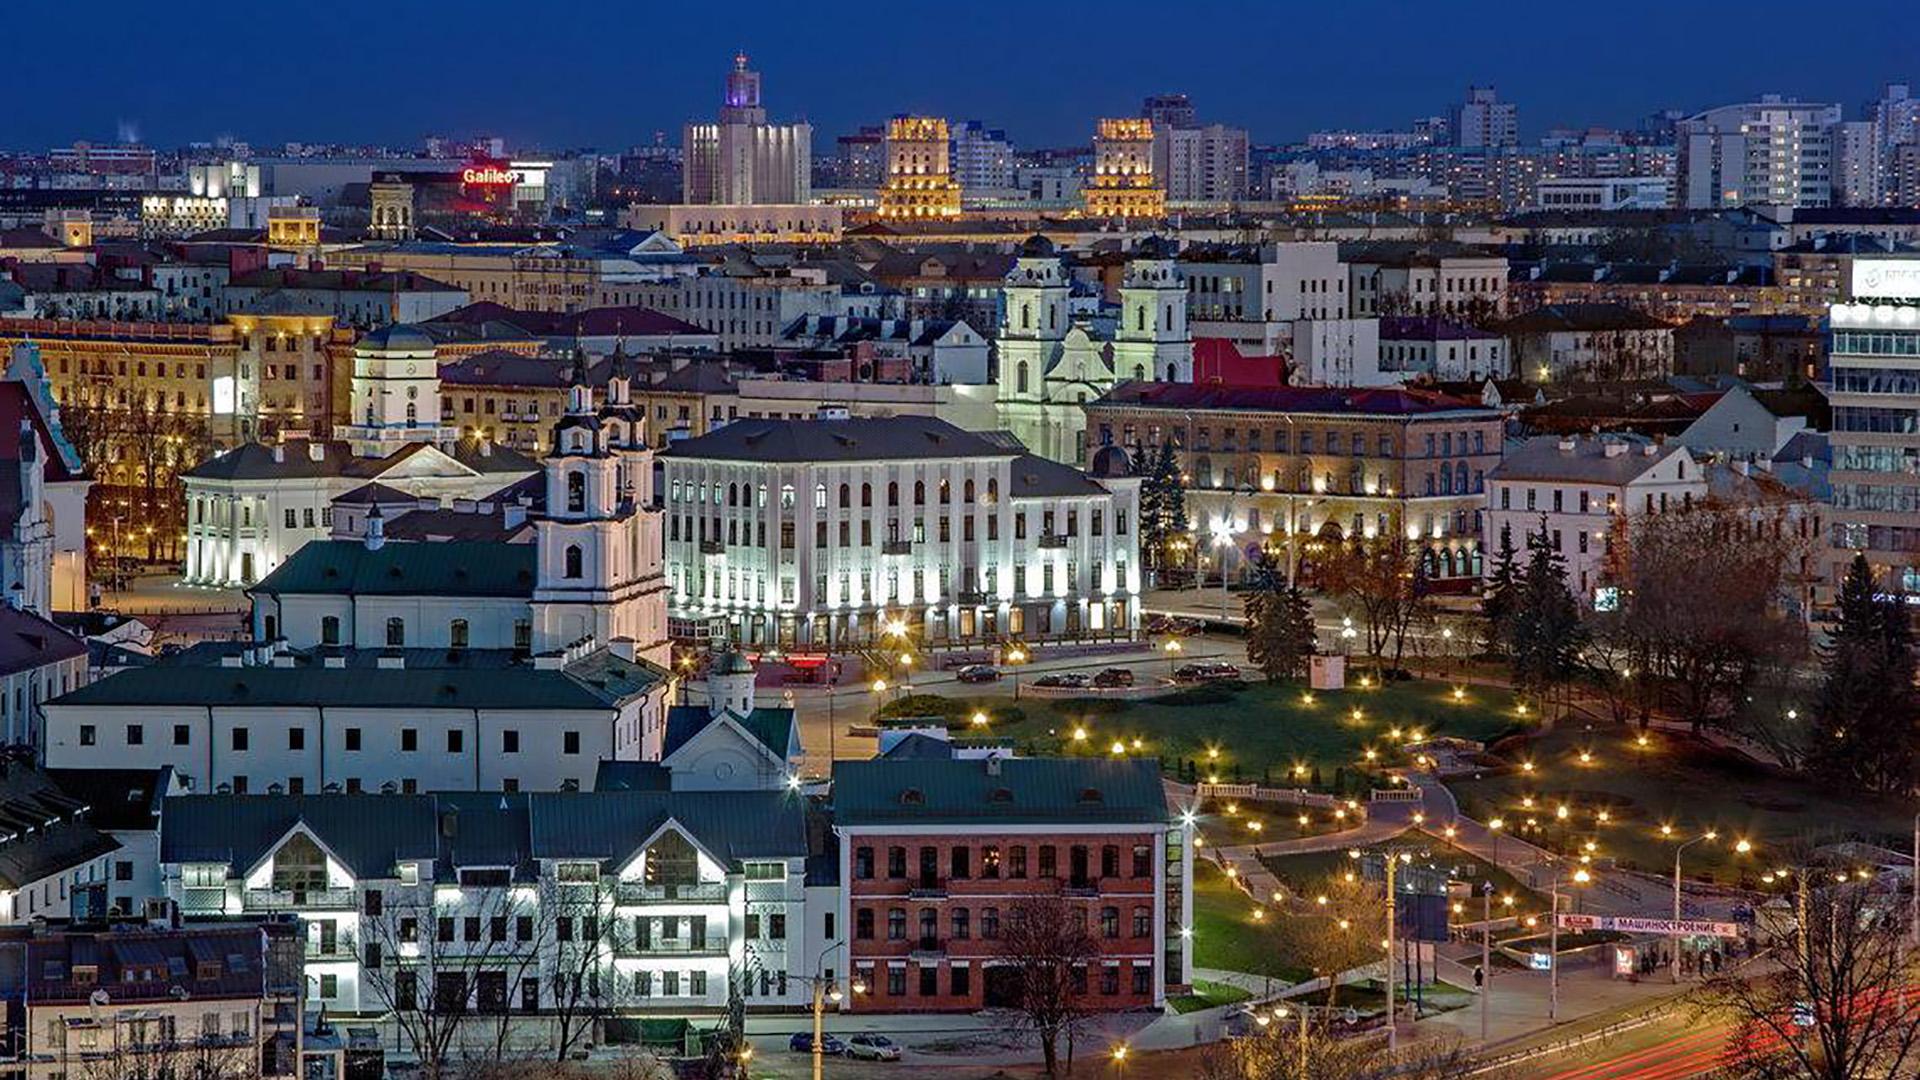 Home Design Images 2015 6 9 November 2014 Quot Interstyle Quot Minsk Belarus Neoqi